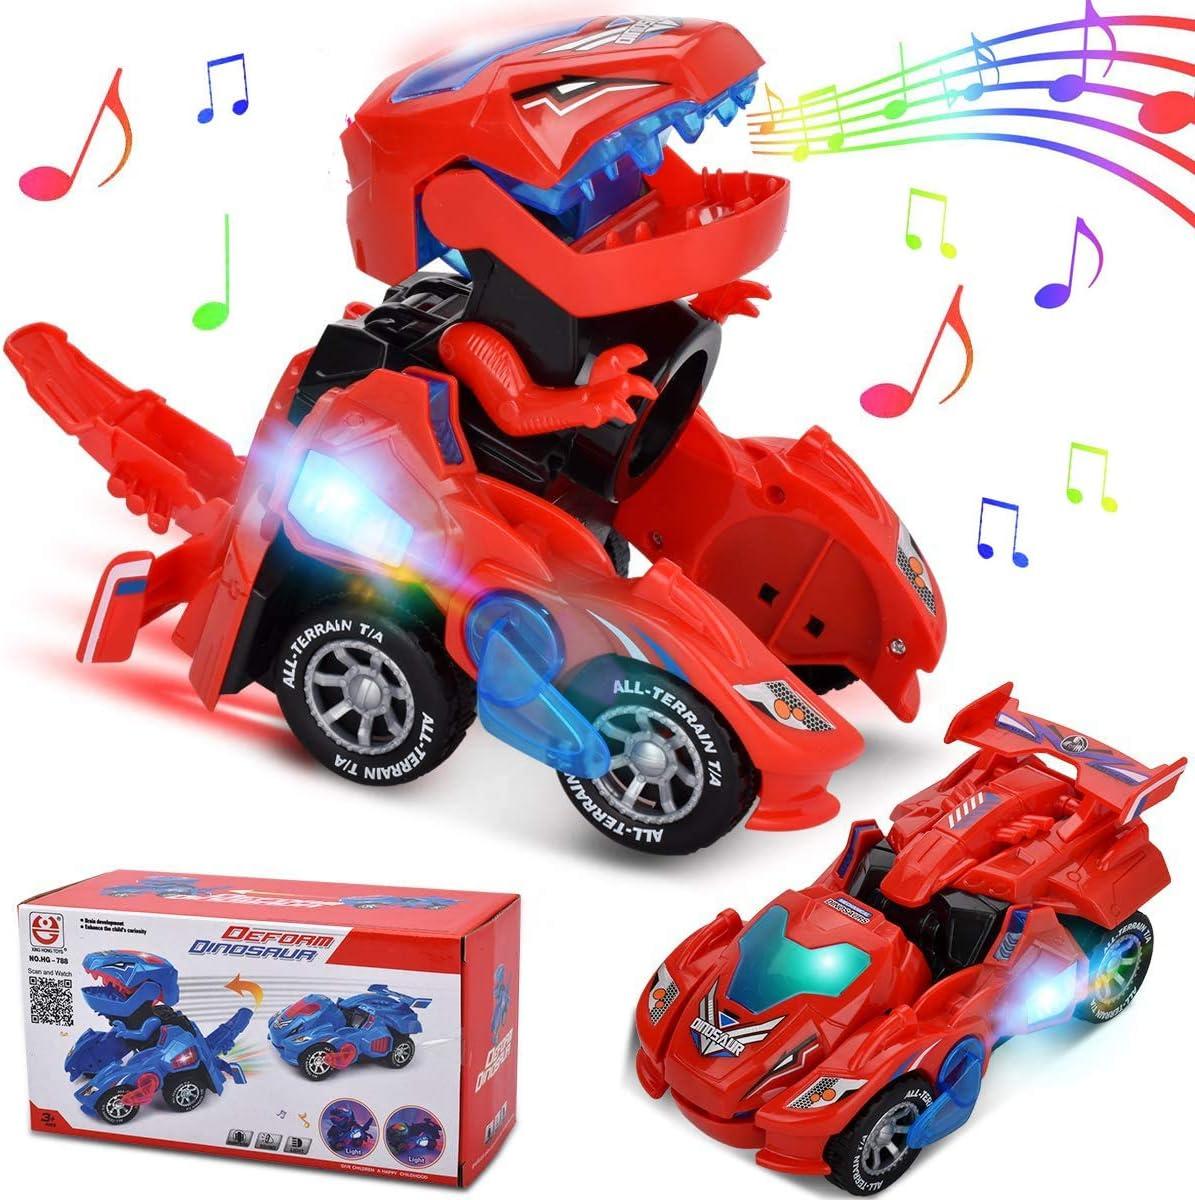 Roboter Transformer Dinosaurier Tier Dinosauria Auto LED Transformieren Kinder